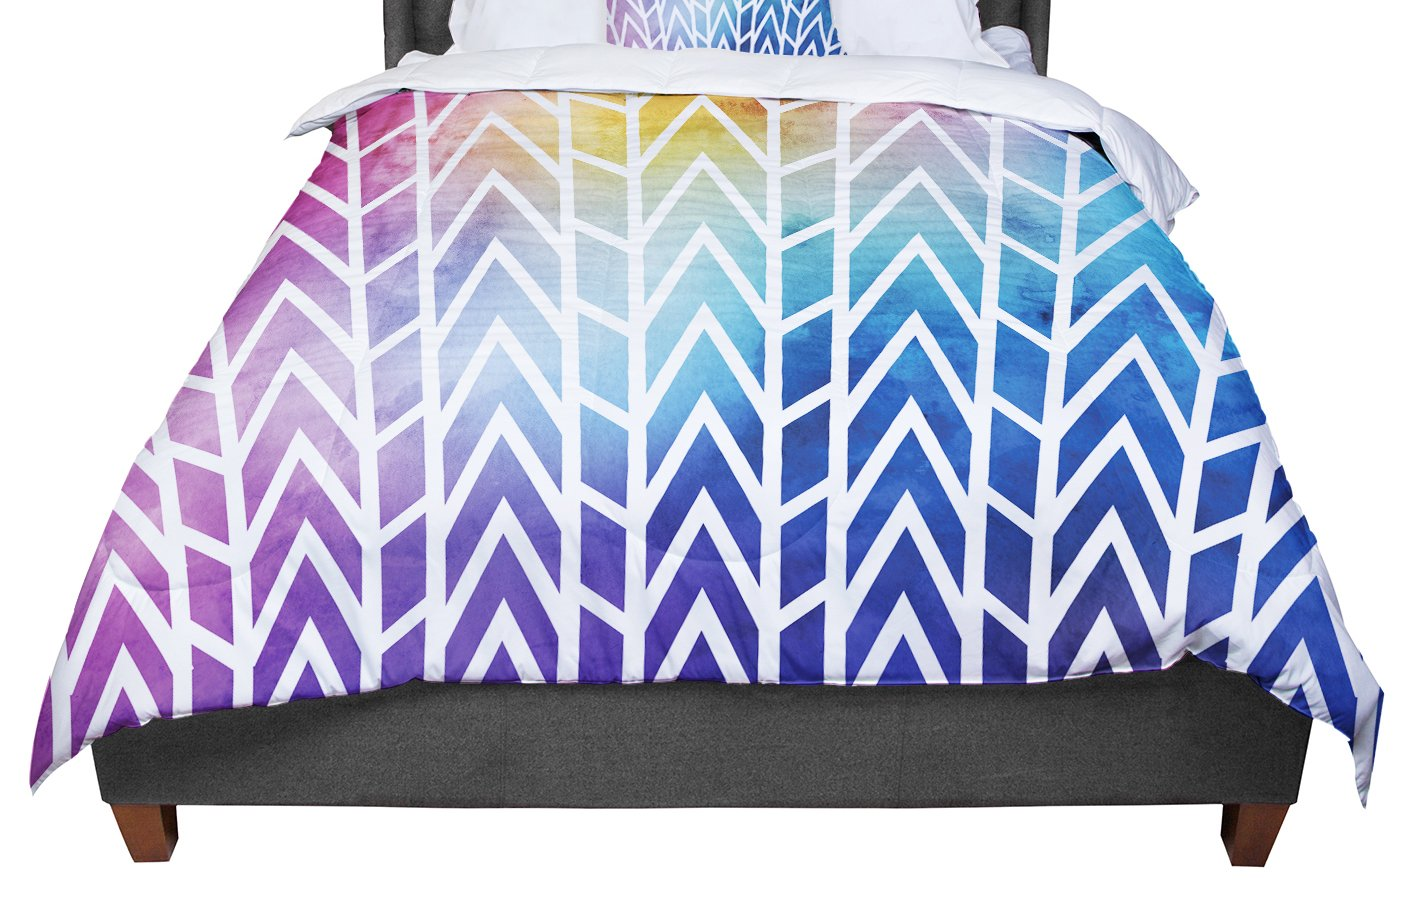 88 X 88 KESS InHouse Matt Eklund Shattering Rainbows Multicolor Abstract Queen Comforter